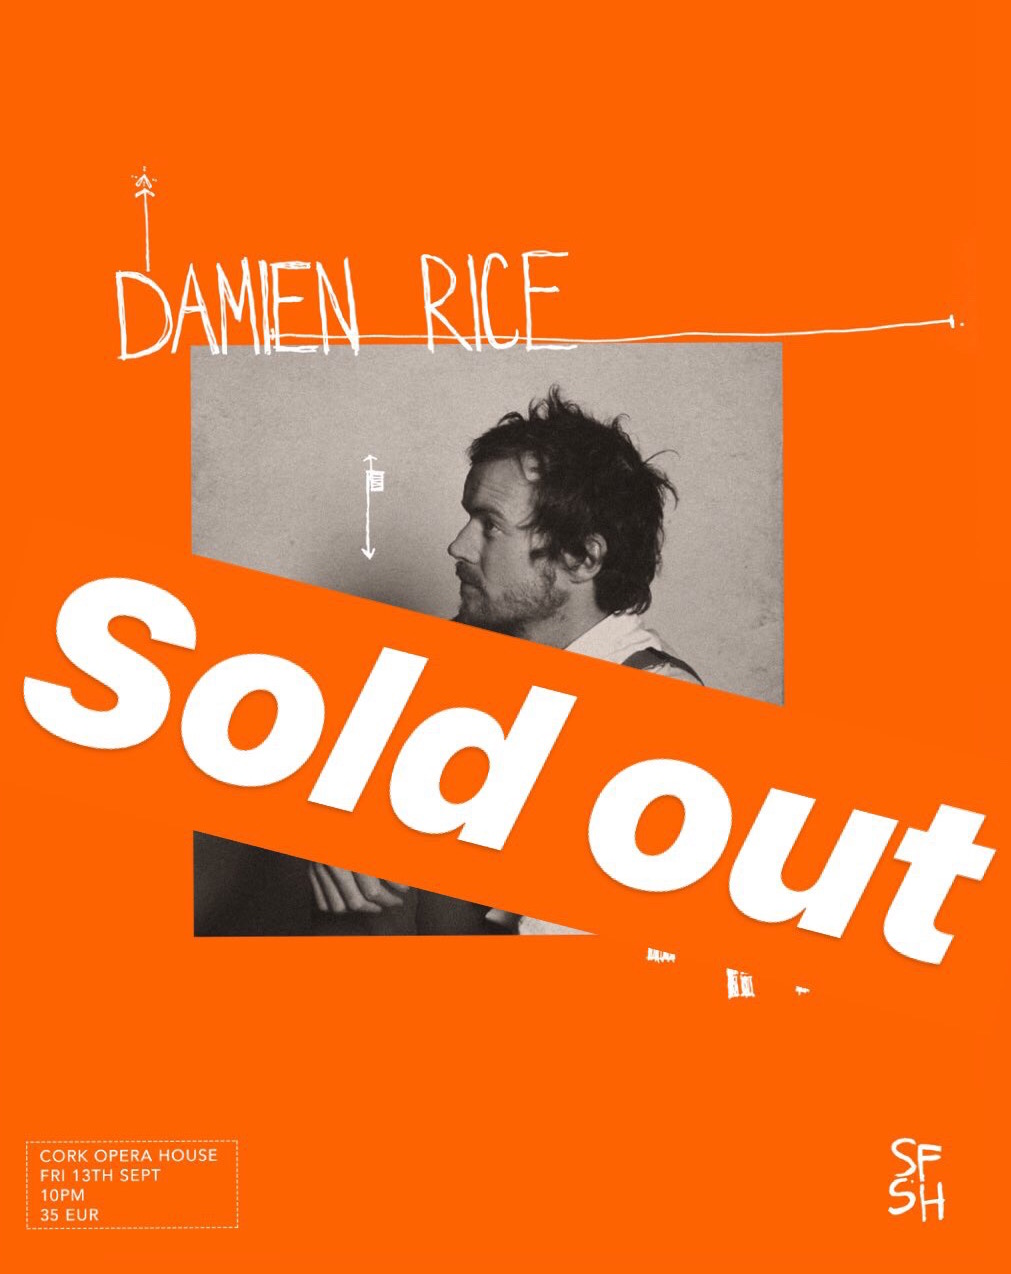 Damien Rice Official Website - Music, Tour, News, Community